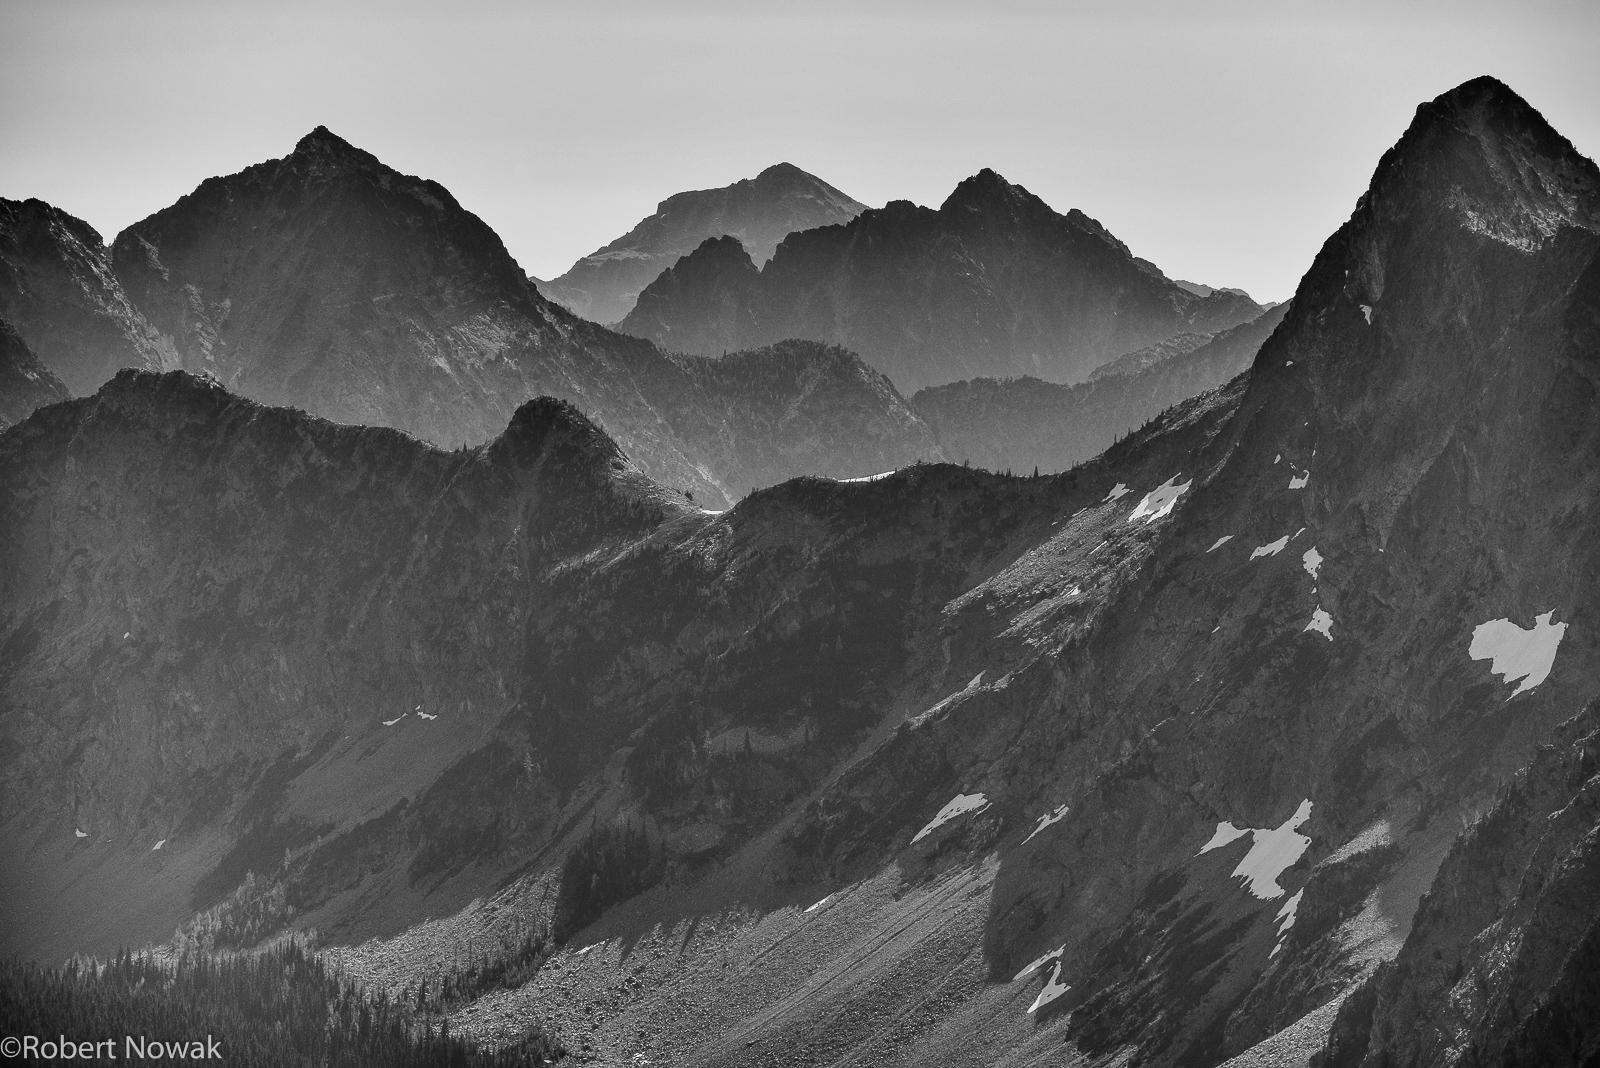 mountains, Maple Pass, Okanogan National Forest, Washington, peaks, Cascades, photo